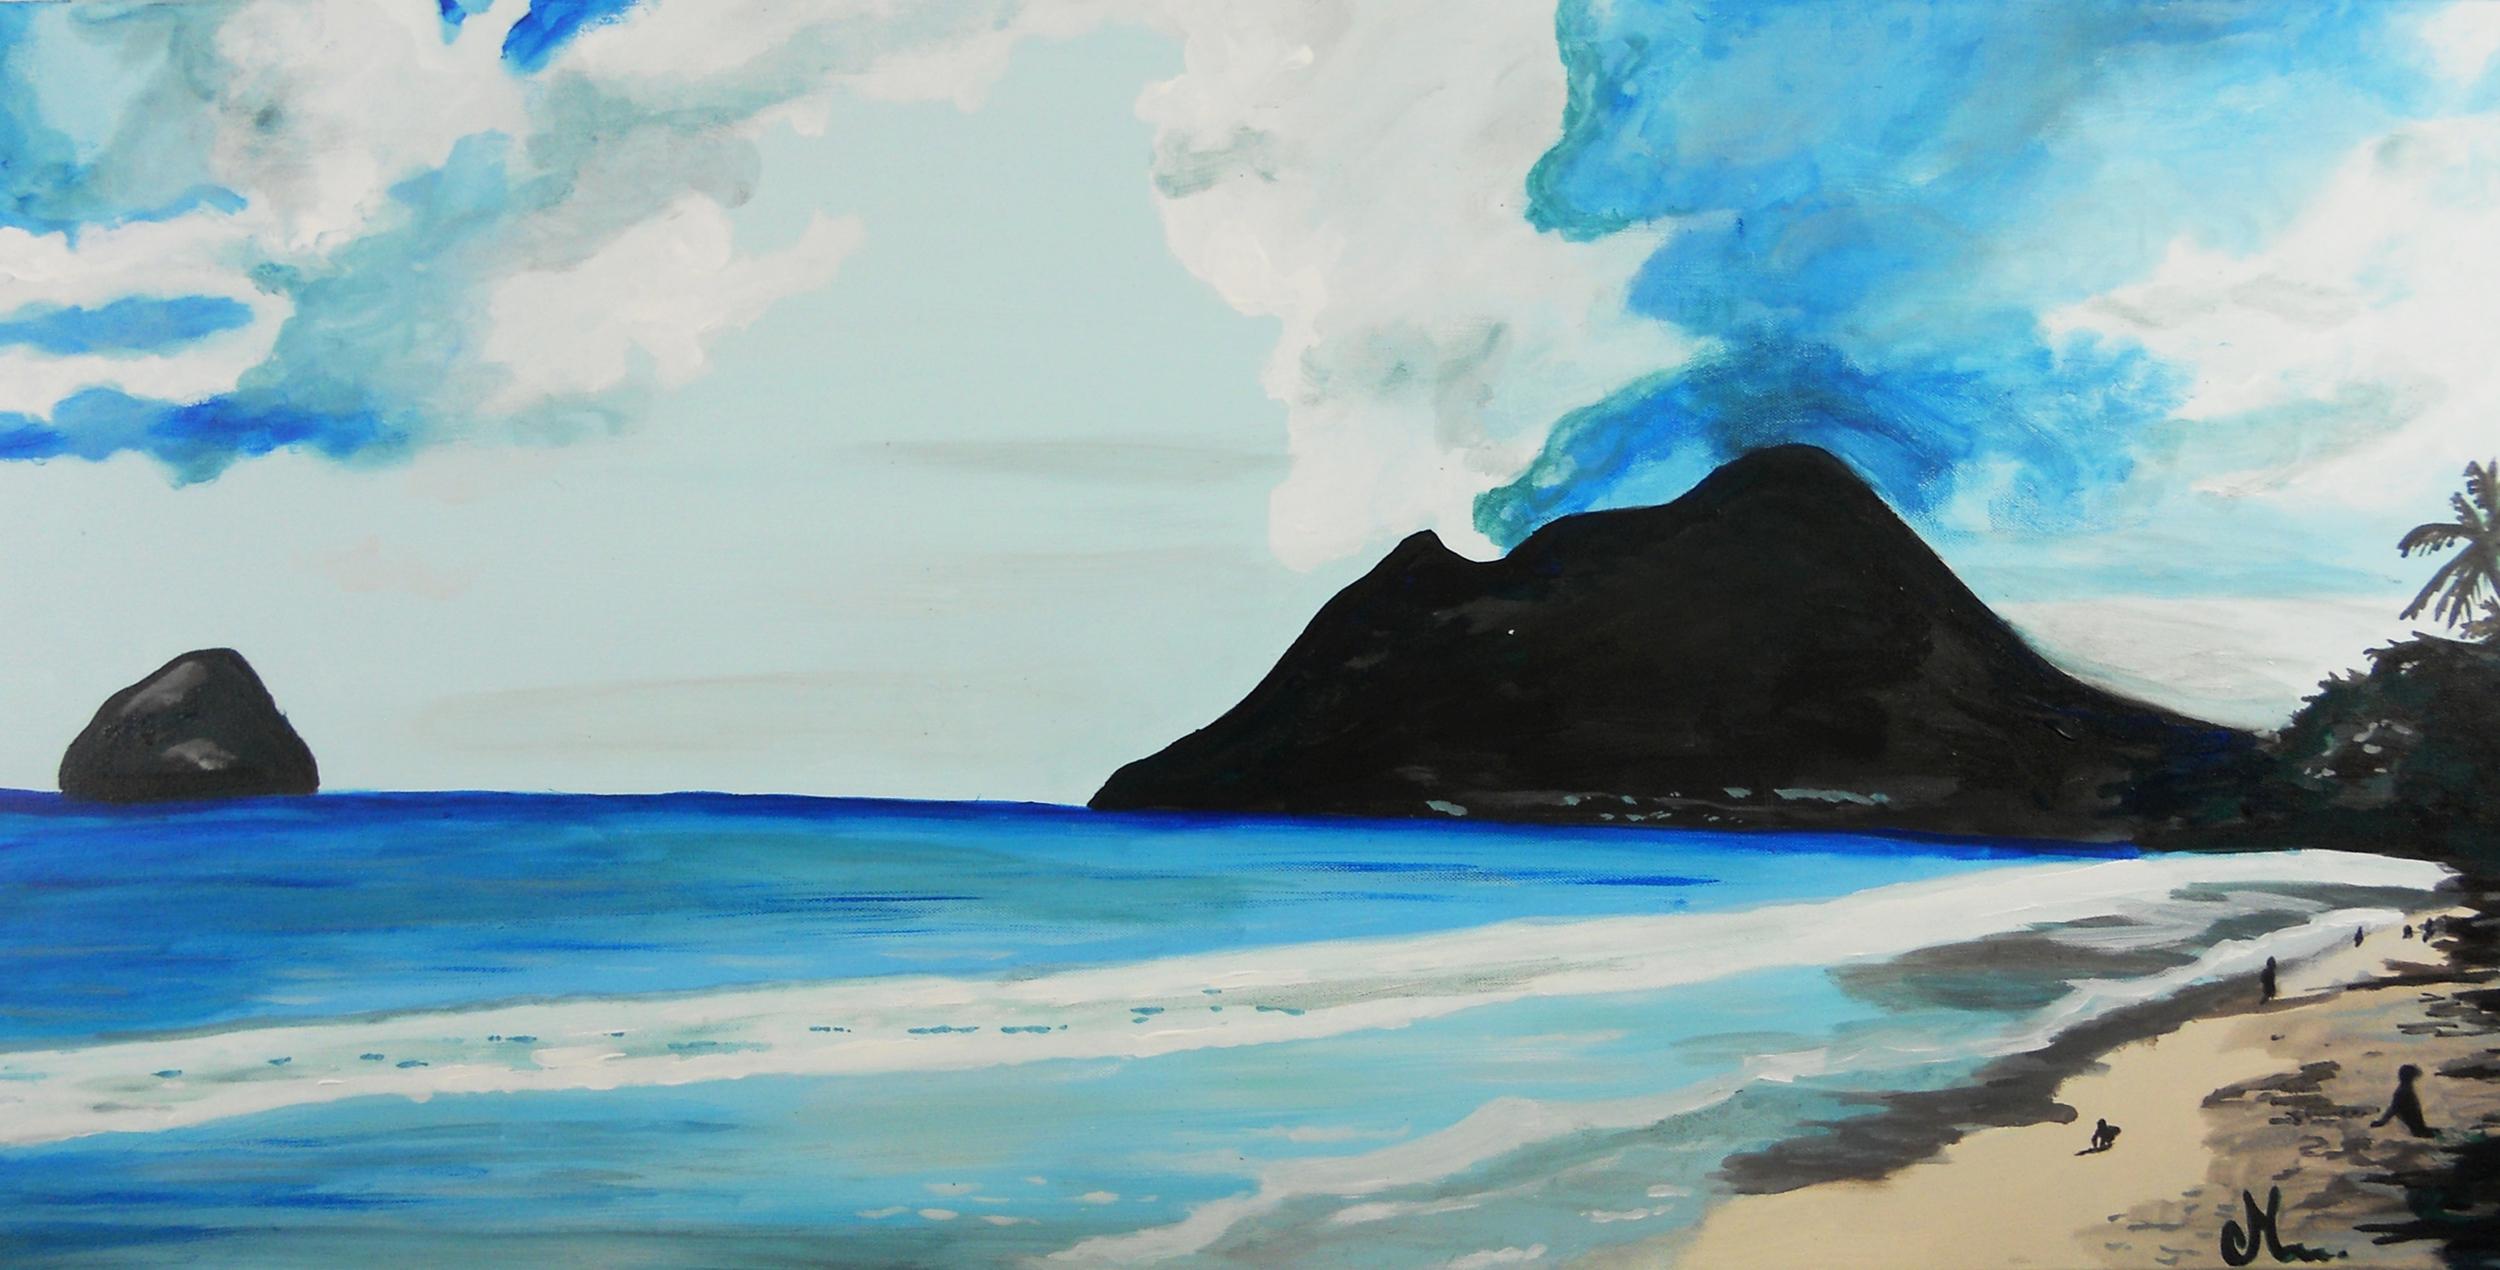 Tableau plage mer madinina nature et zen tableau ethnique nature et zen decoroots - Tableaux mer et plage ...